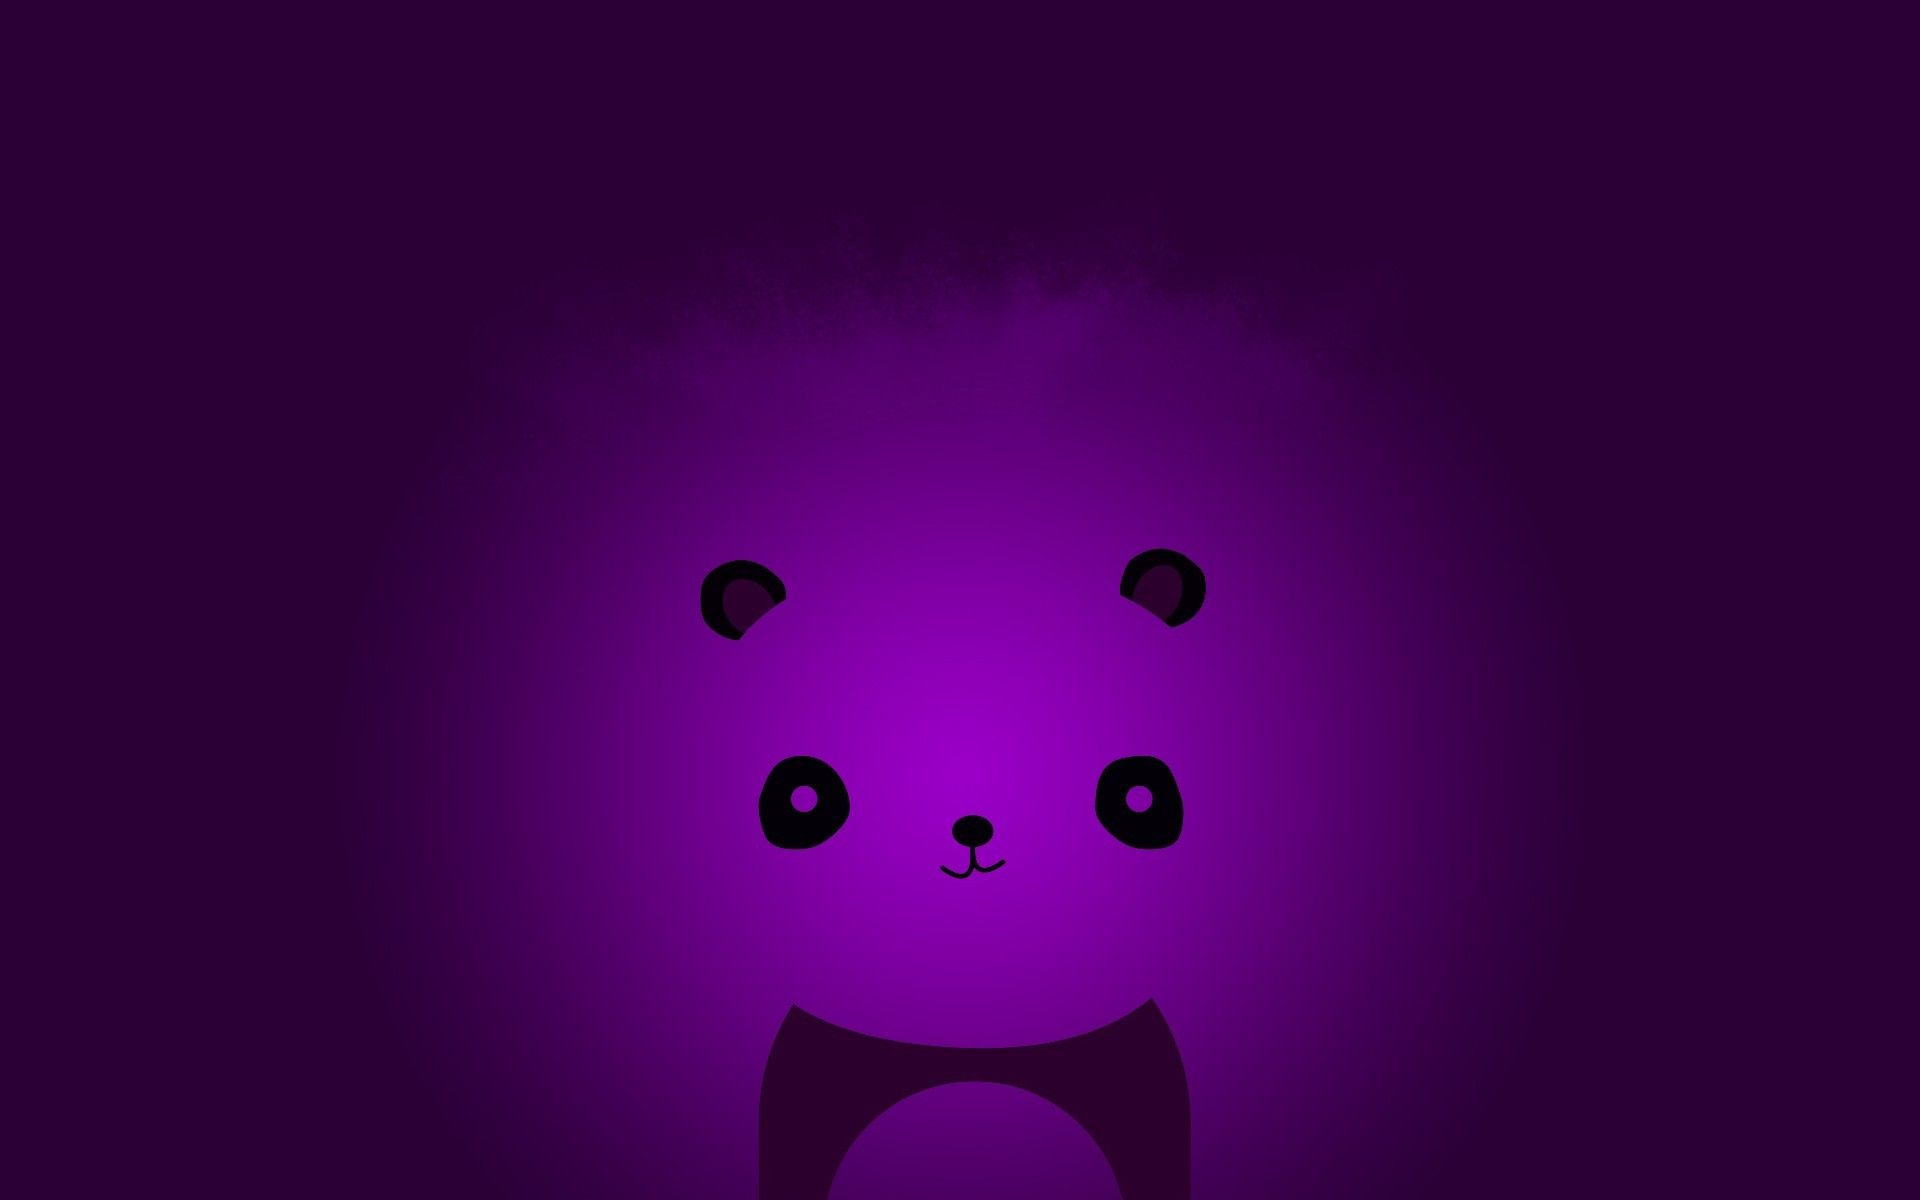 Abstract minimalistic violet panda bears wallpaper | | 61005 |  WallpaperUP